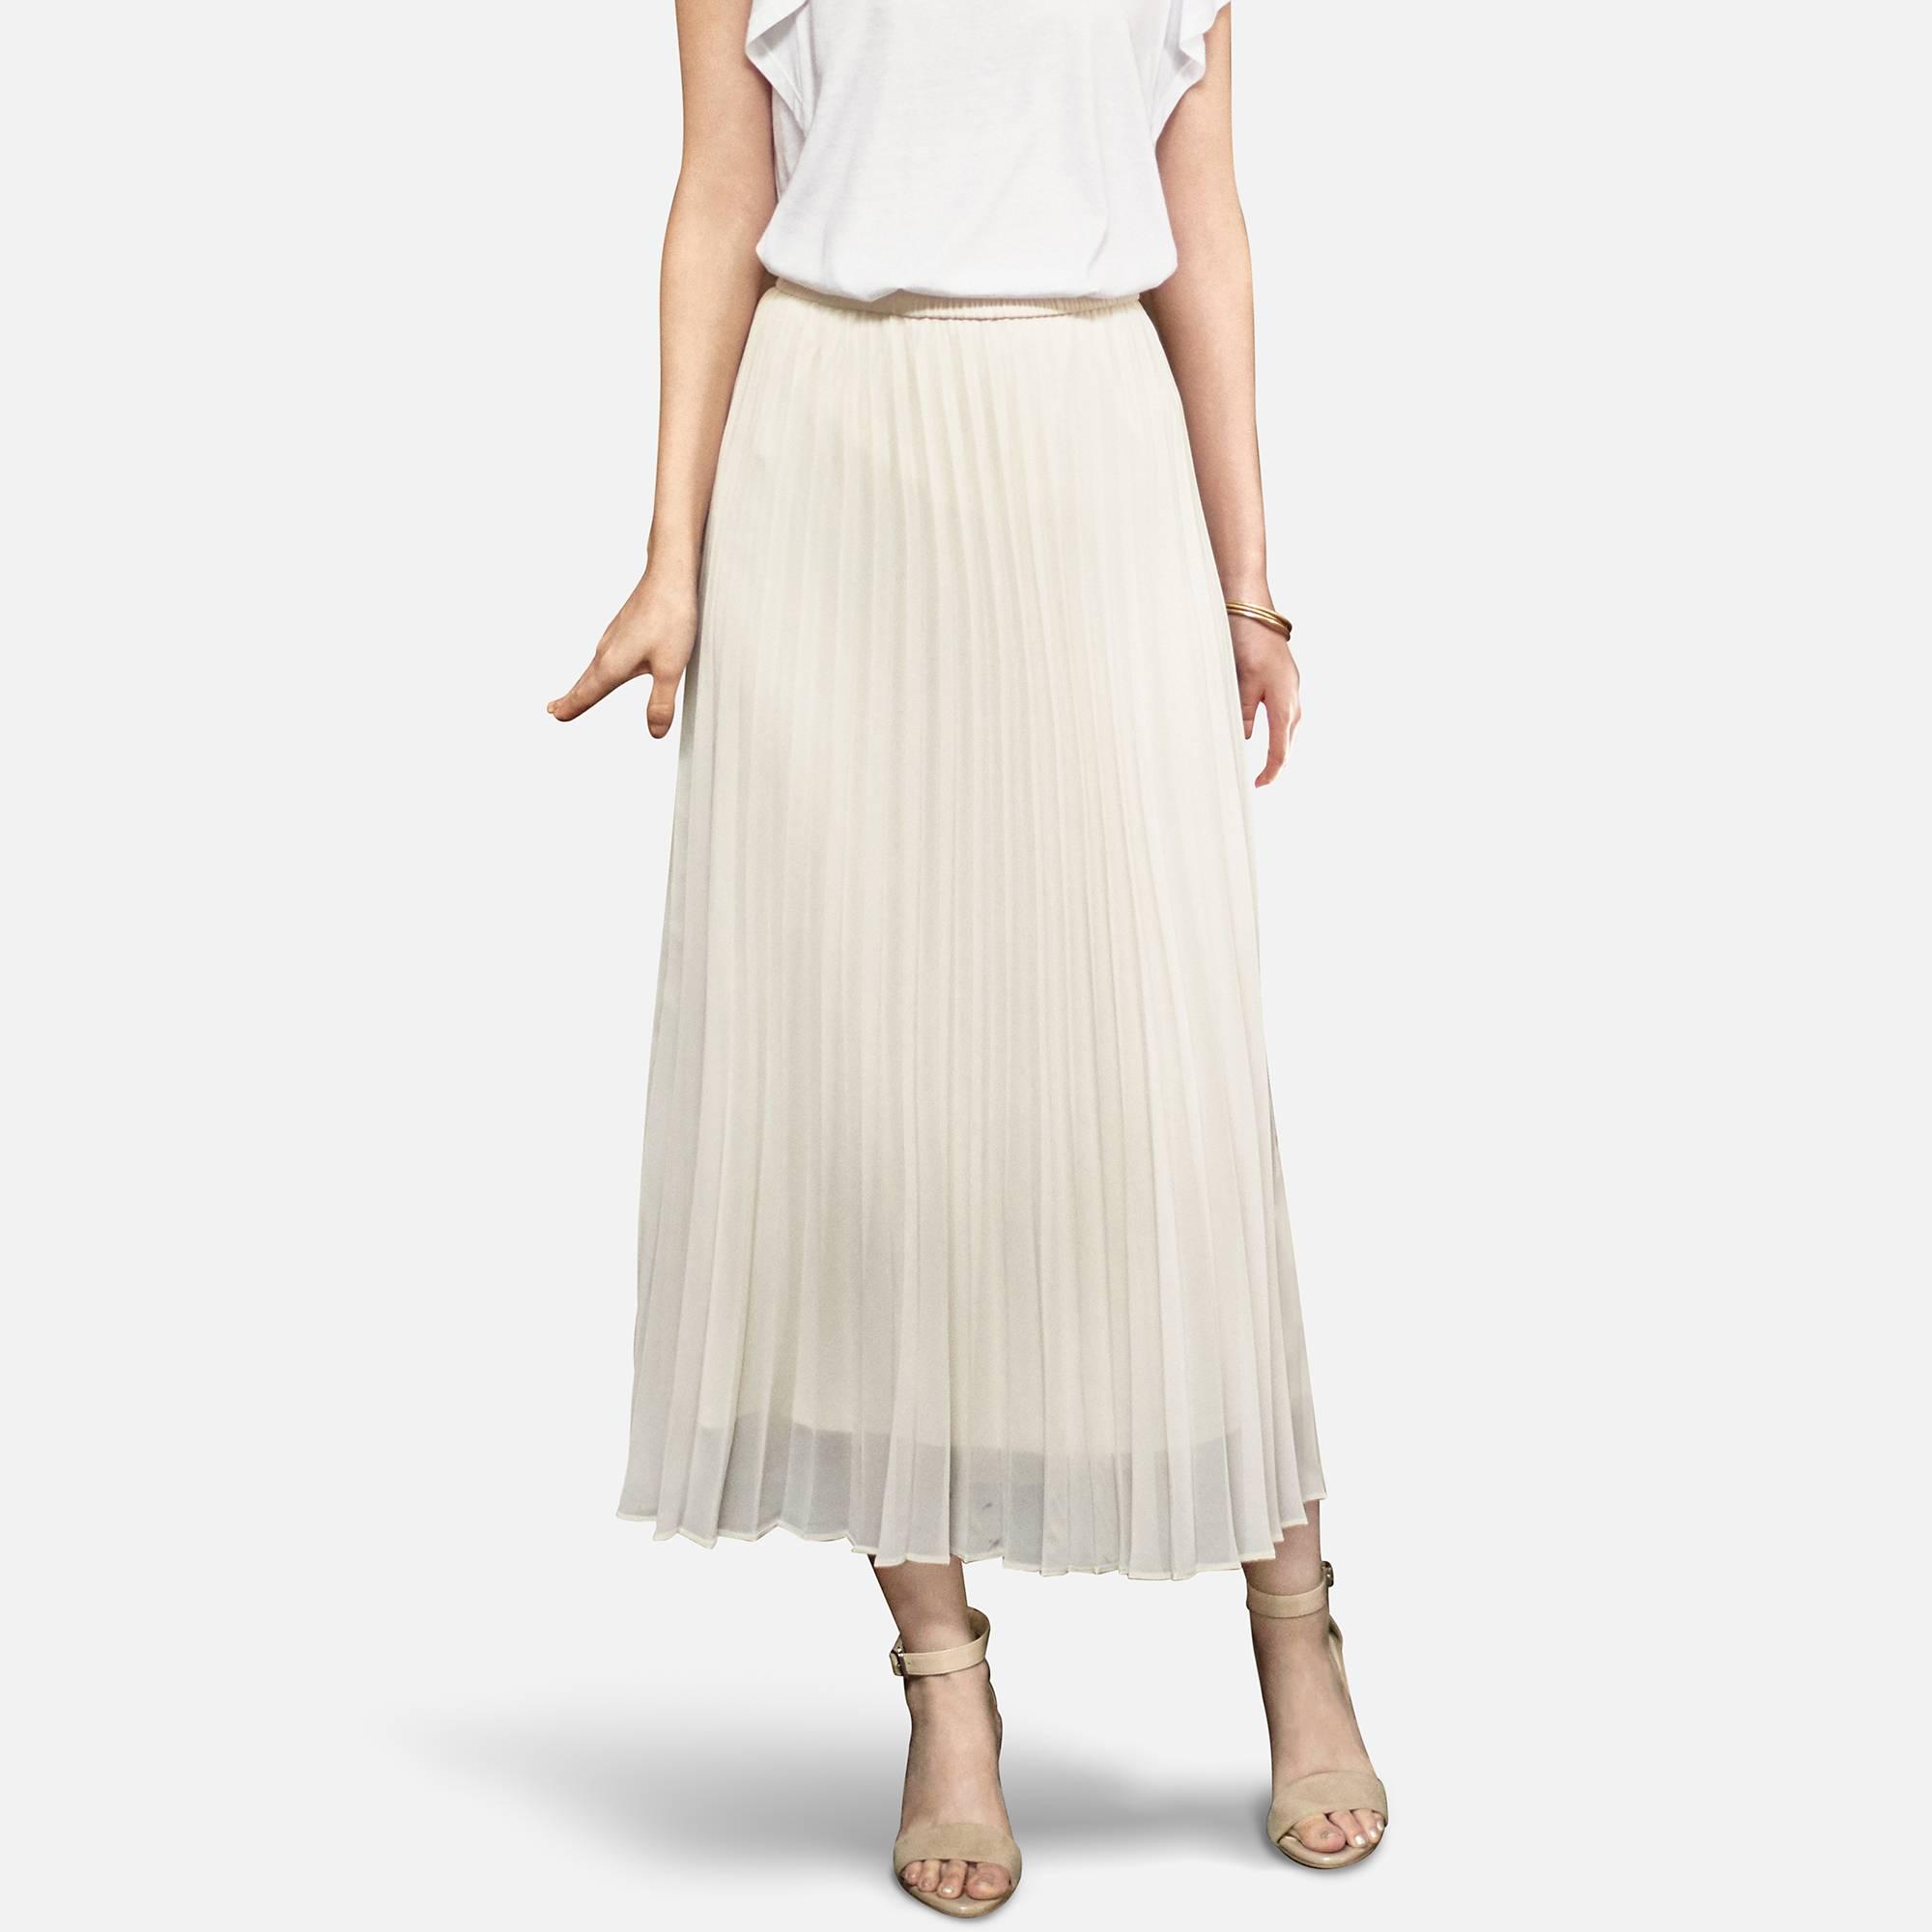 Dresses skirts clothes women disney store - Women Chiffon Pleated Skirt Light Gray Small